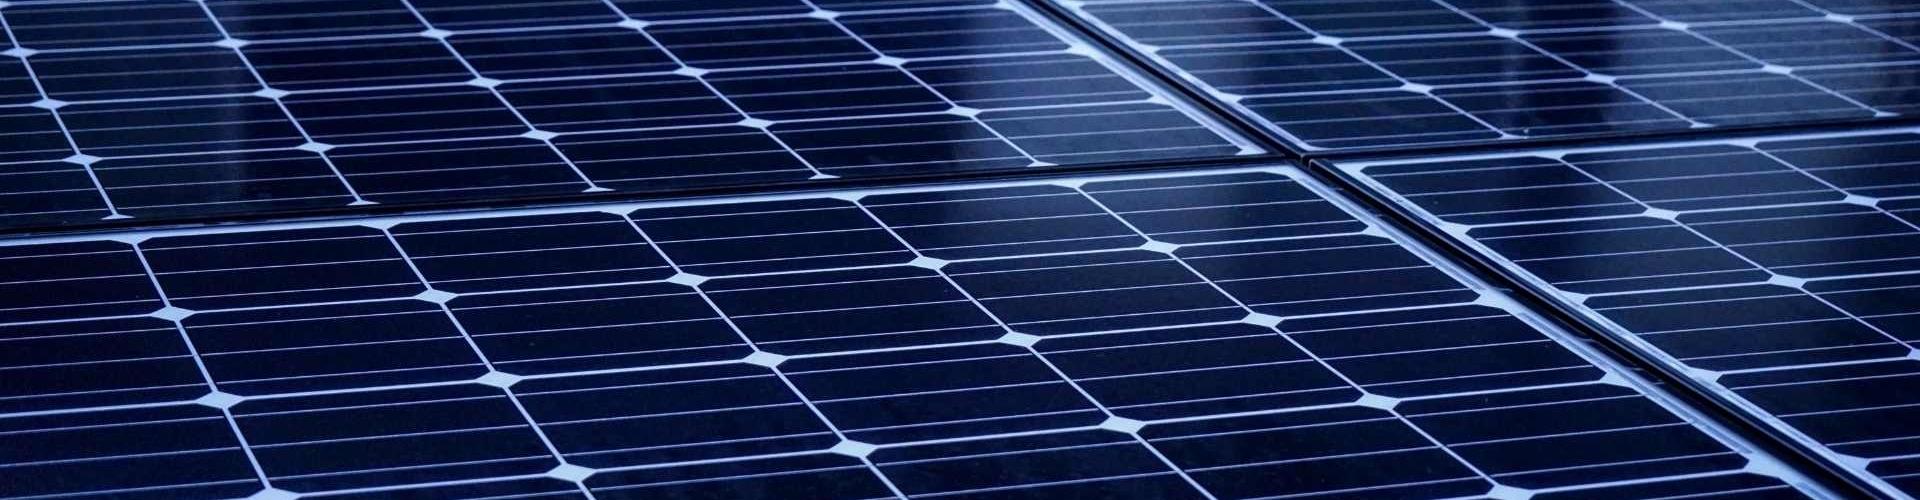 goedkope zonnepanelen sets